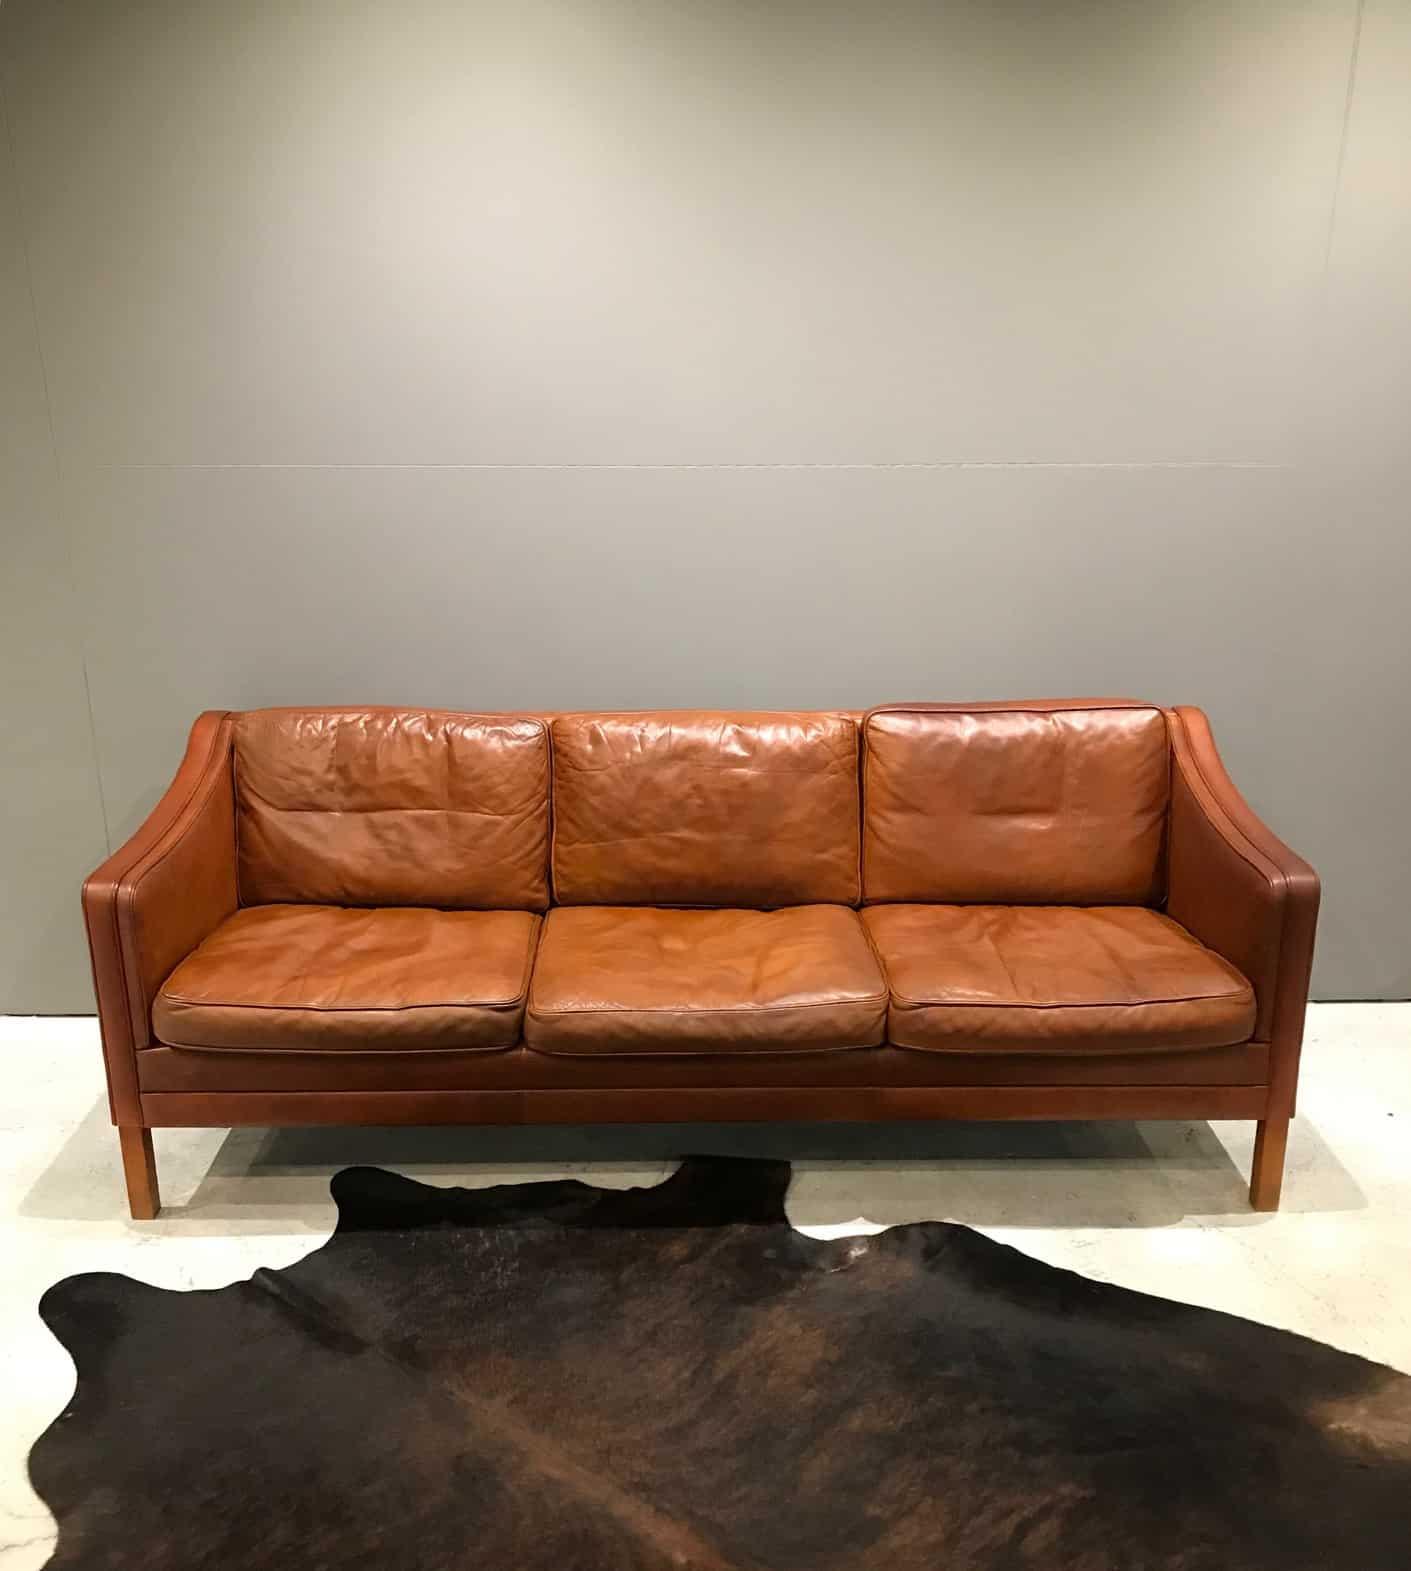 Vintage Danish Leather Sofa Mid Century Furniture Melbourne